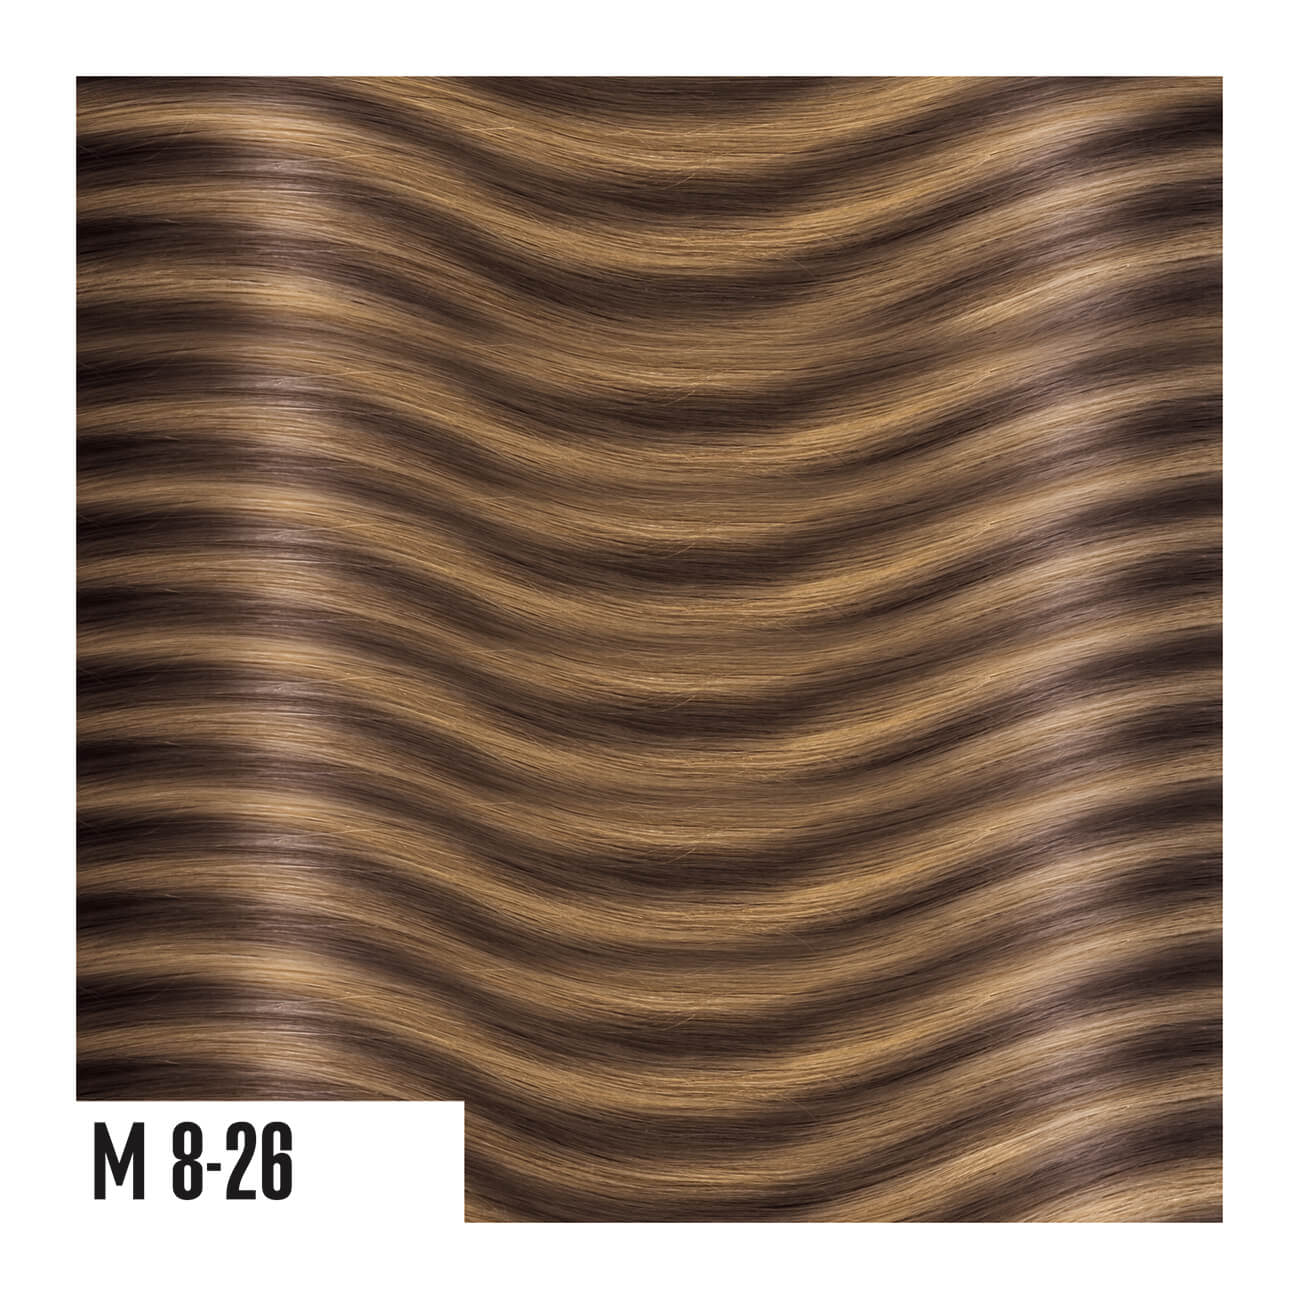 M8-26